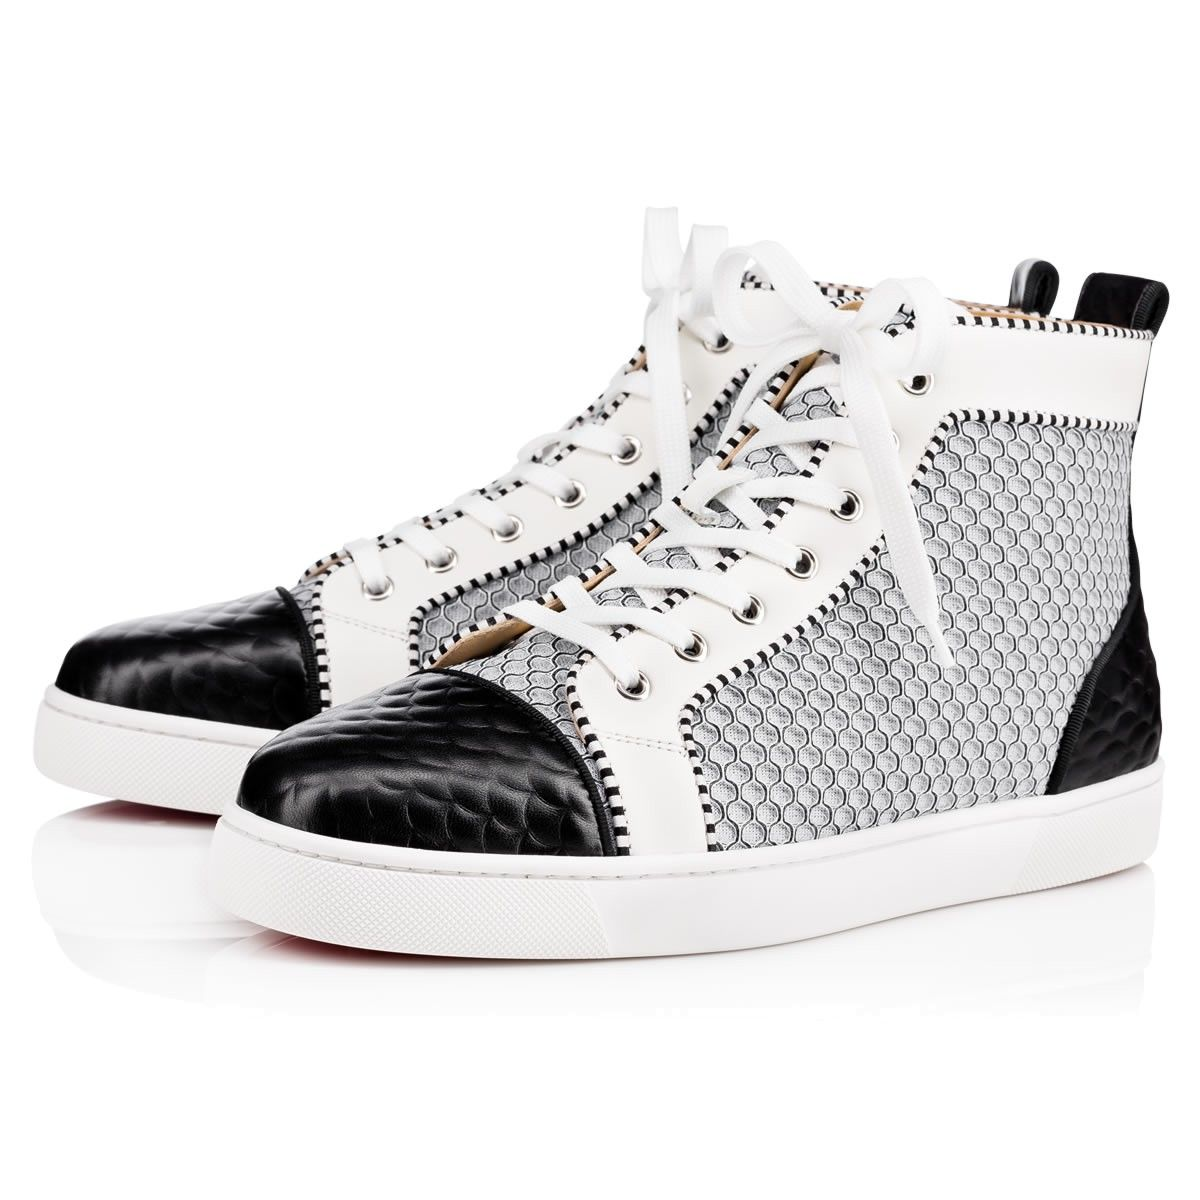 CHRISTIAN LOUBOUTIN Louis Orlato Men S Flat Version Black White Leather.   christianlouboutin  shoes   90b861ab5a33